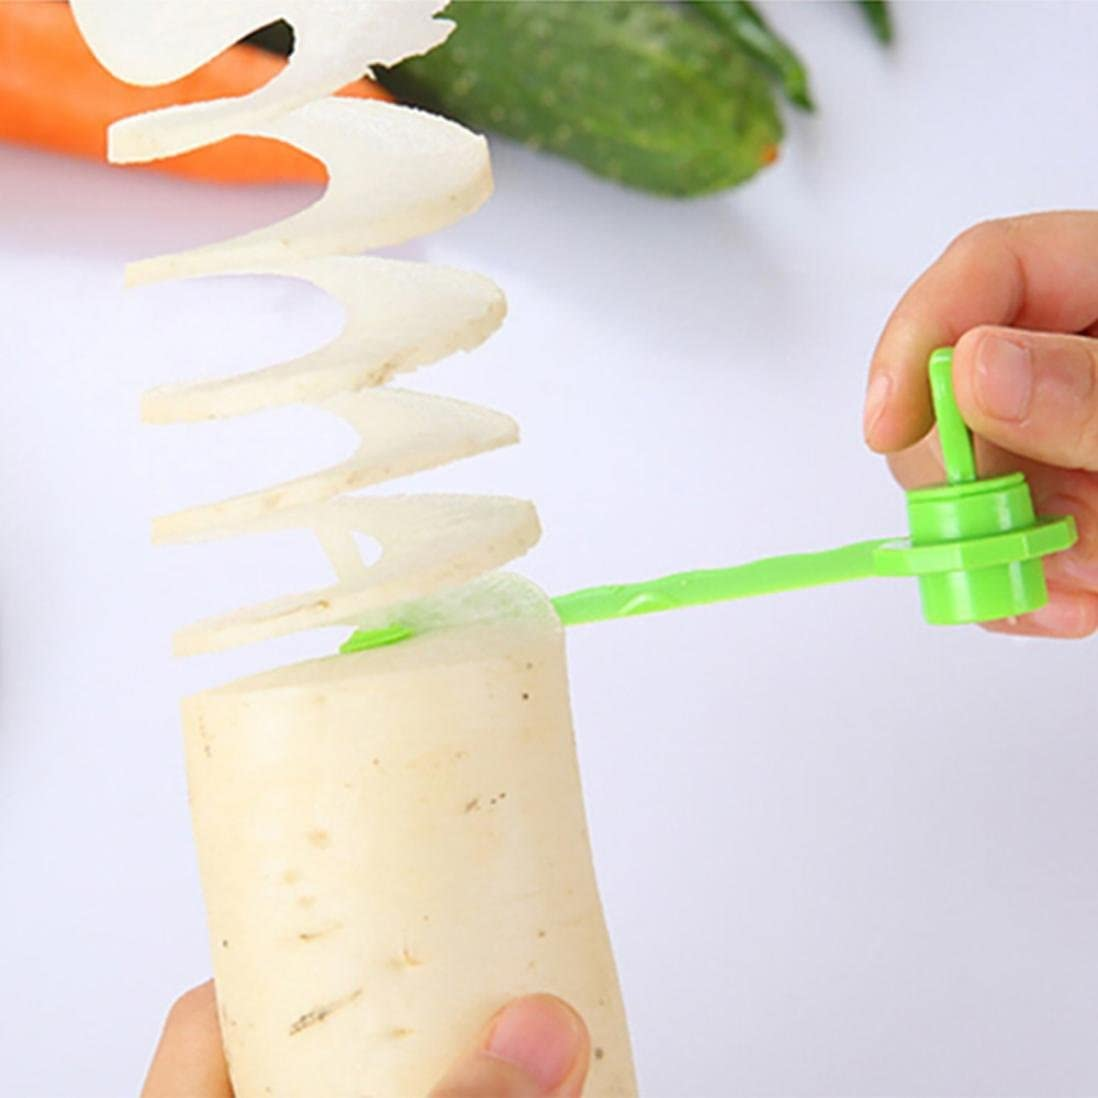 Carrot Spiral Slicer Potato Spiral Slicer Cutter Cooking Accessories U6I2